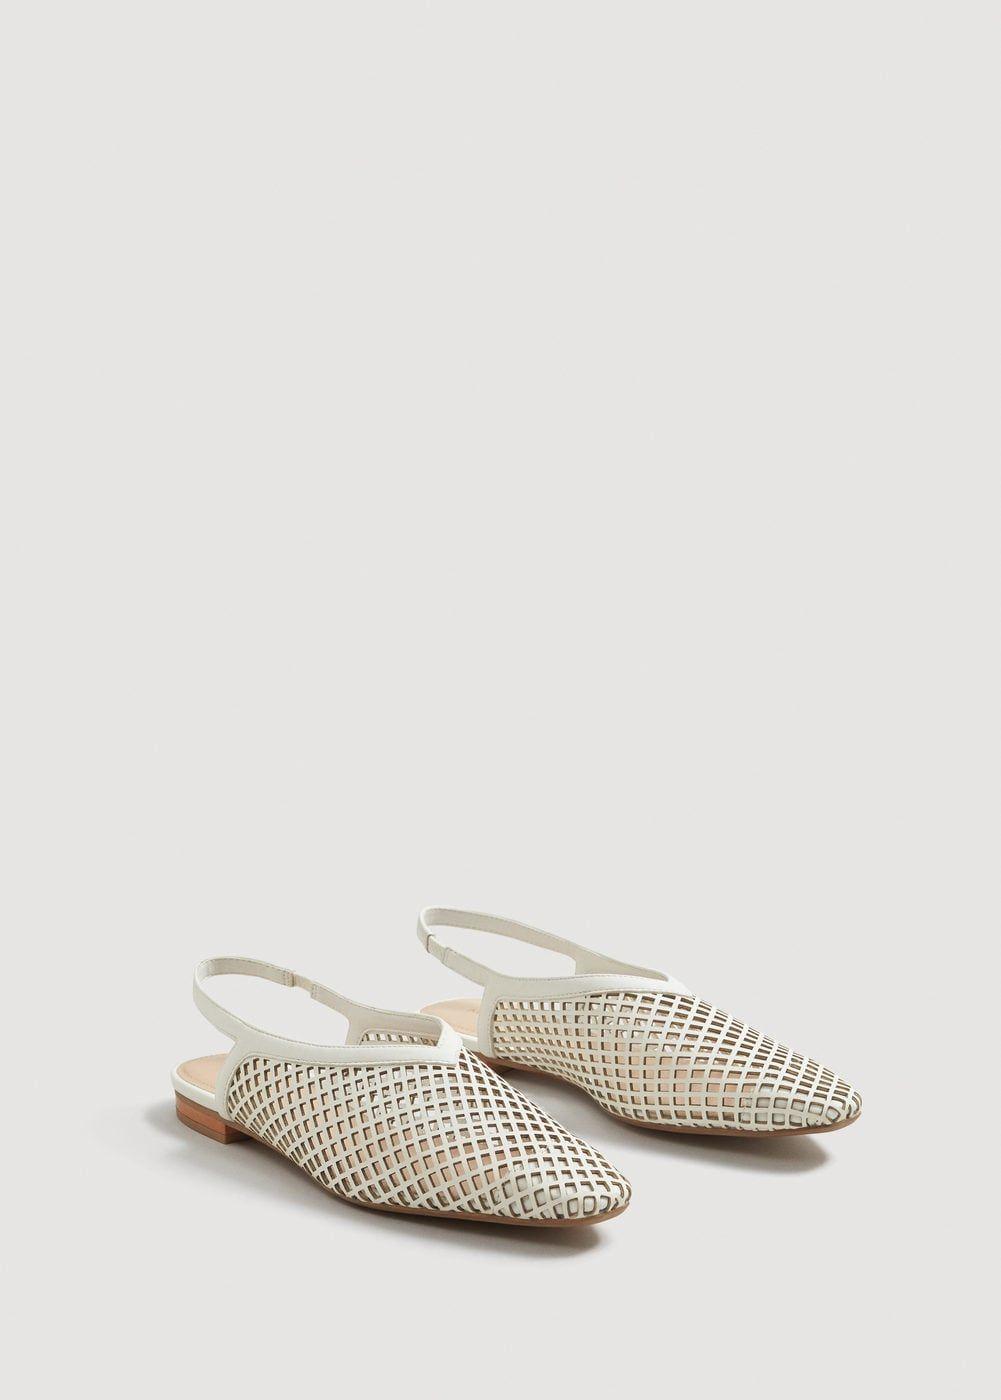 6f8b95f61ced0 Laser-cut slingback shoes - Women | Accessories | Slingback shoes ...